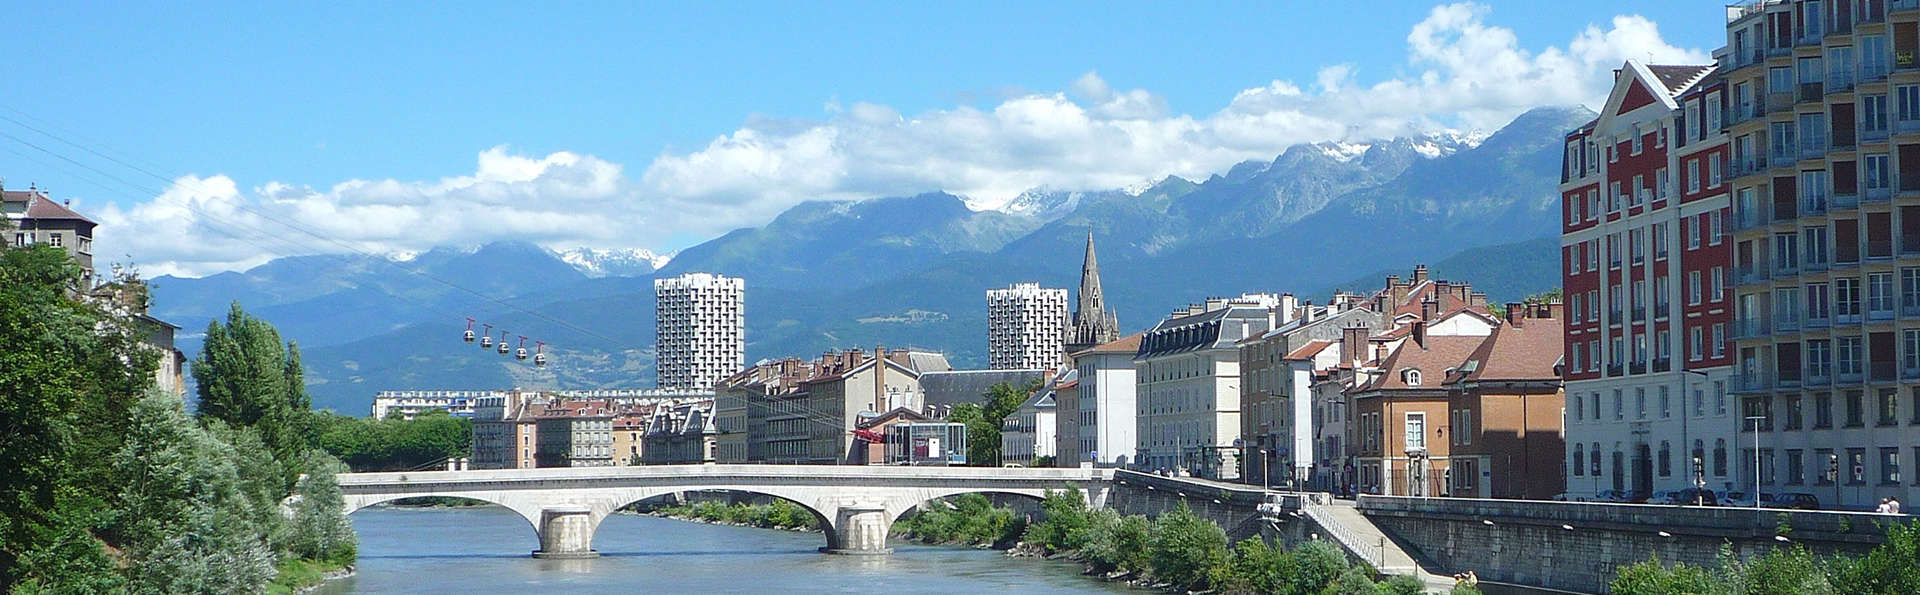 Le Royal Hôtel Grenoble Centre - edit_grenoble2.jpg